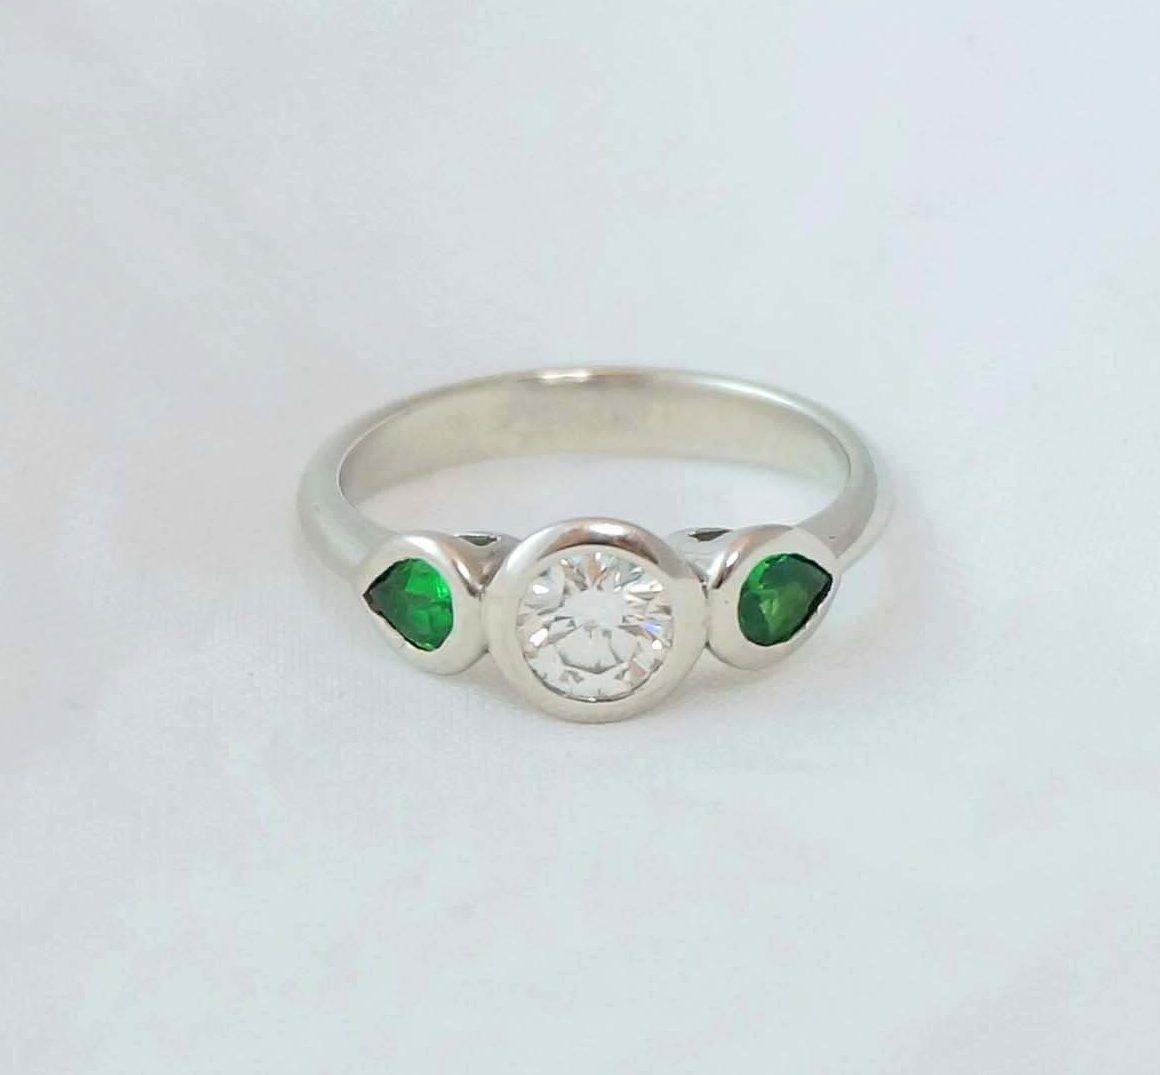 Park Road Jewellery, Bespoke Handmade Engagement Ring Shaped Platinum Diamond Gemstone Personalized Ring